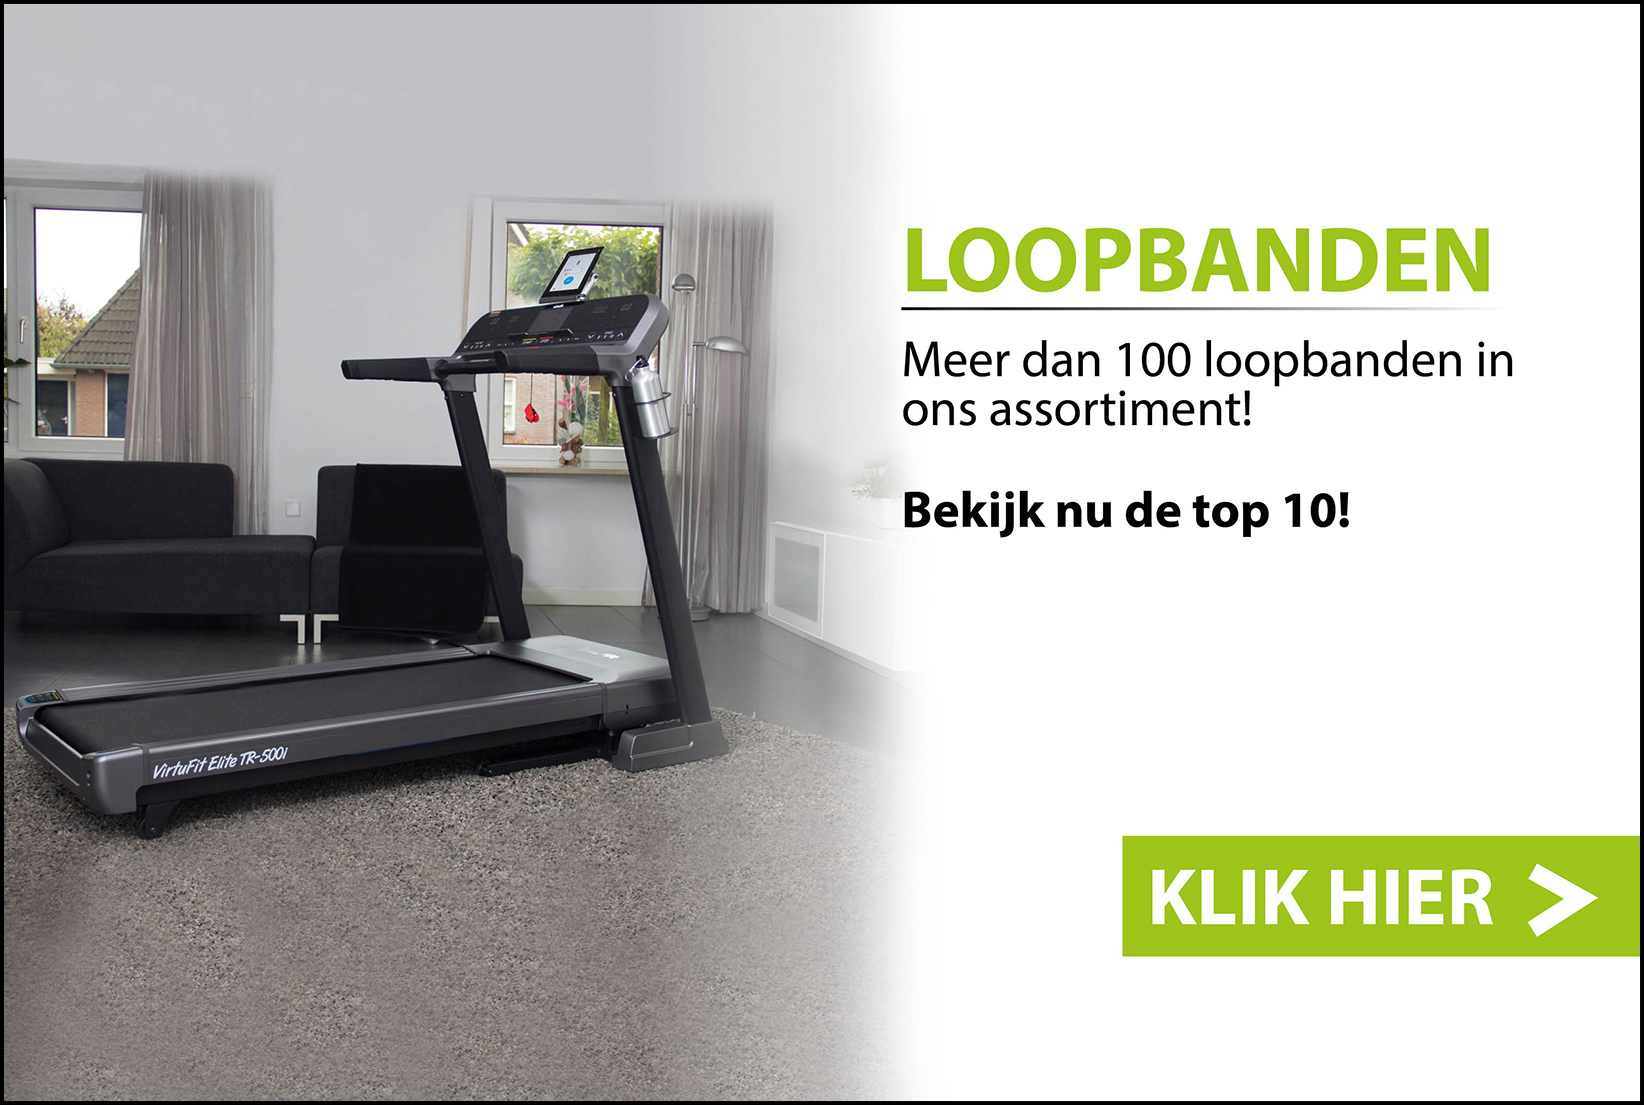 PC / TABLET Fitnessapparaat - Home - Mainbanner